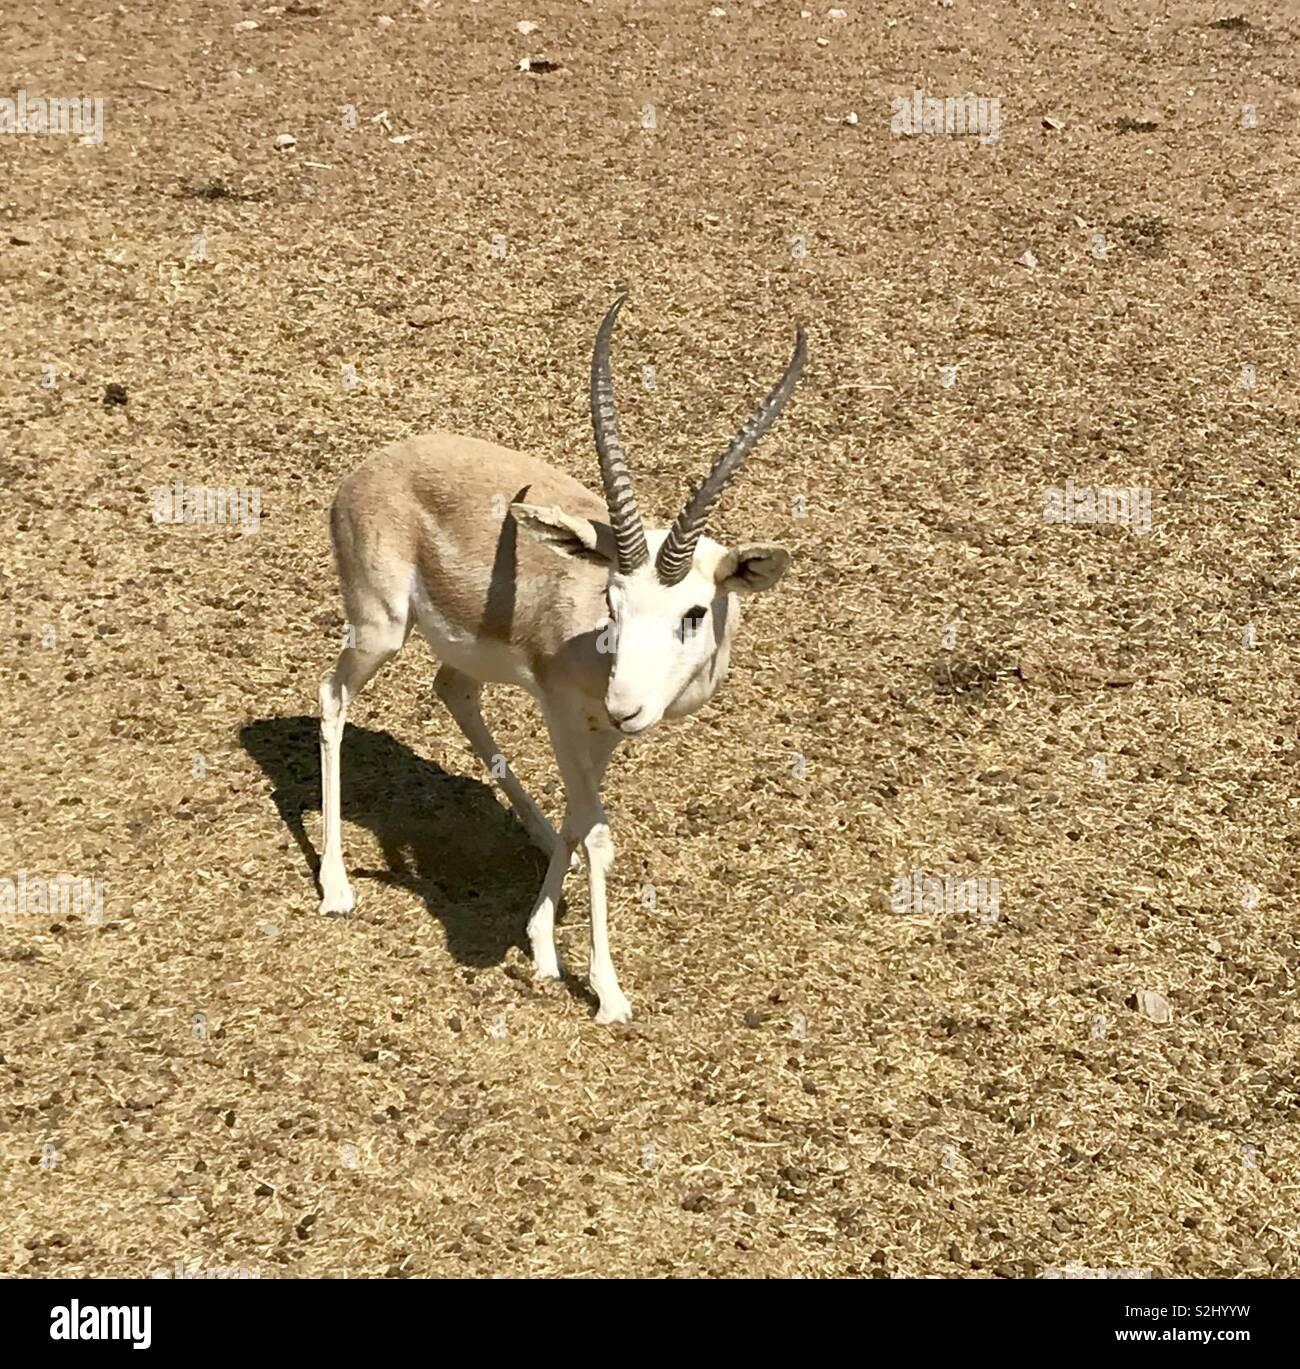 Gazelle at Sir Bani Yas island - Stock Image